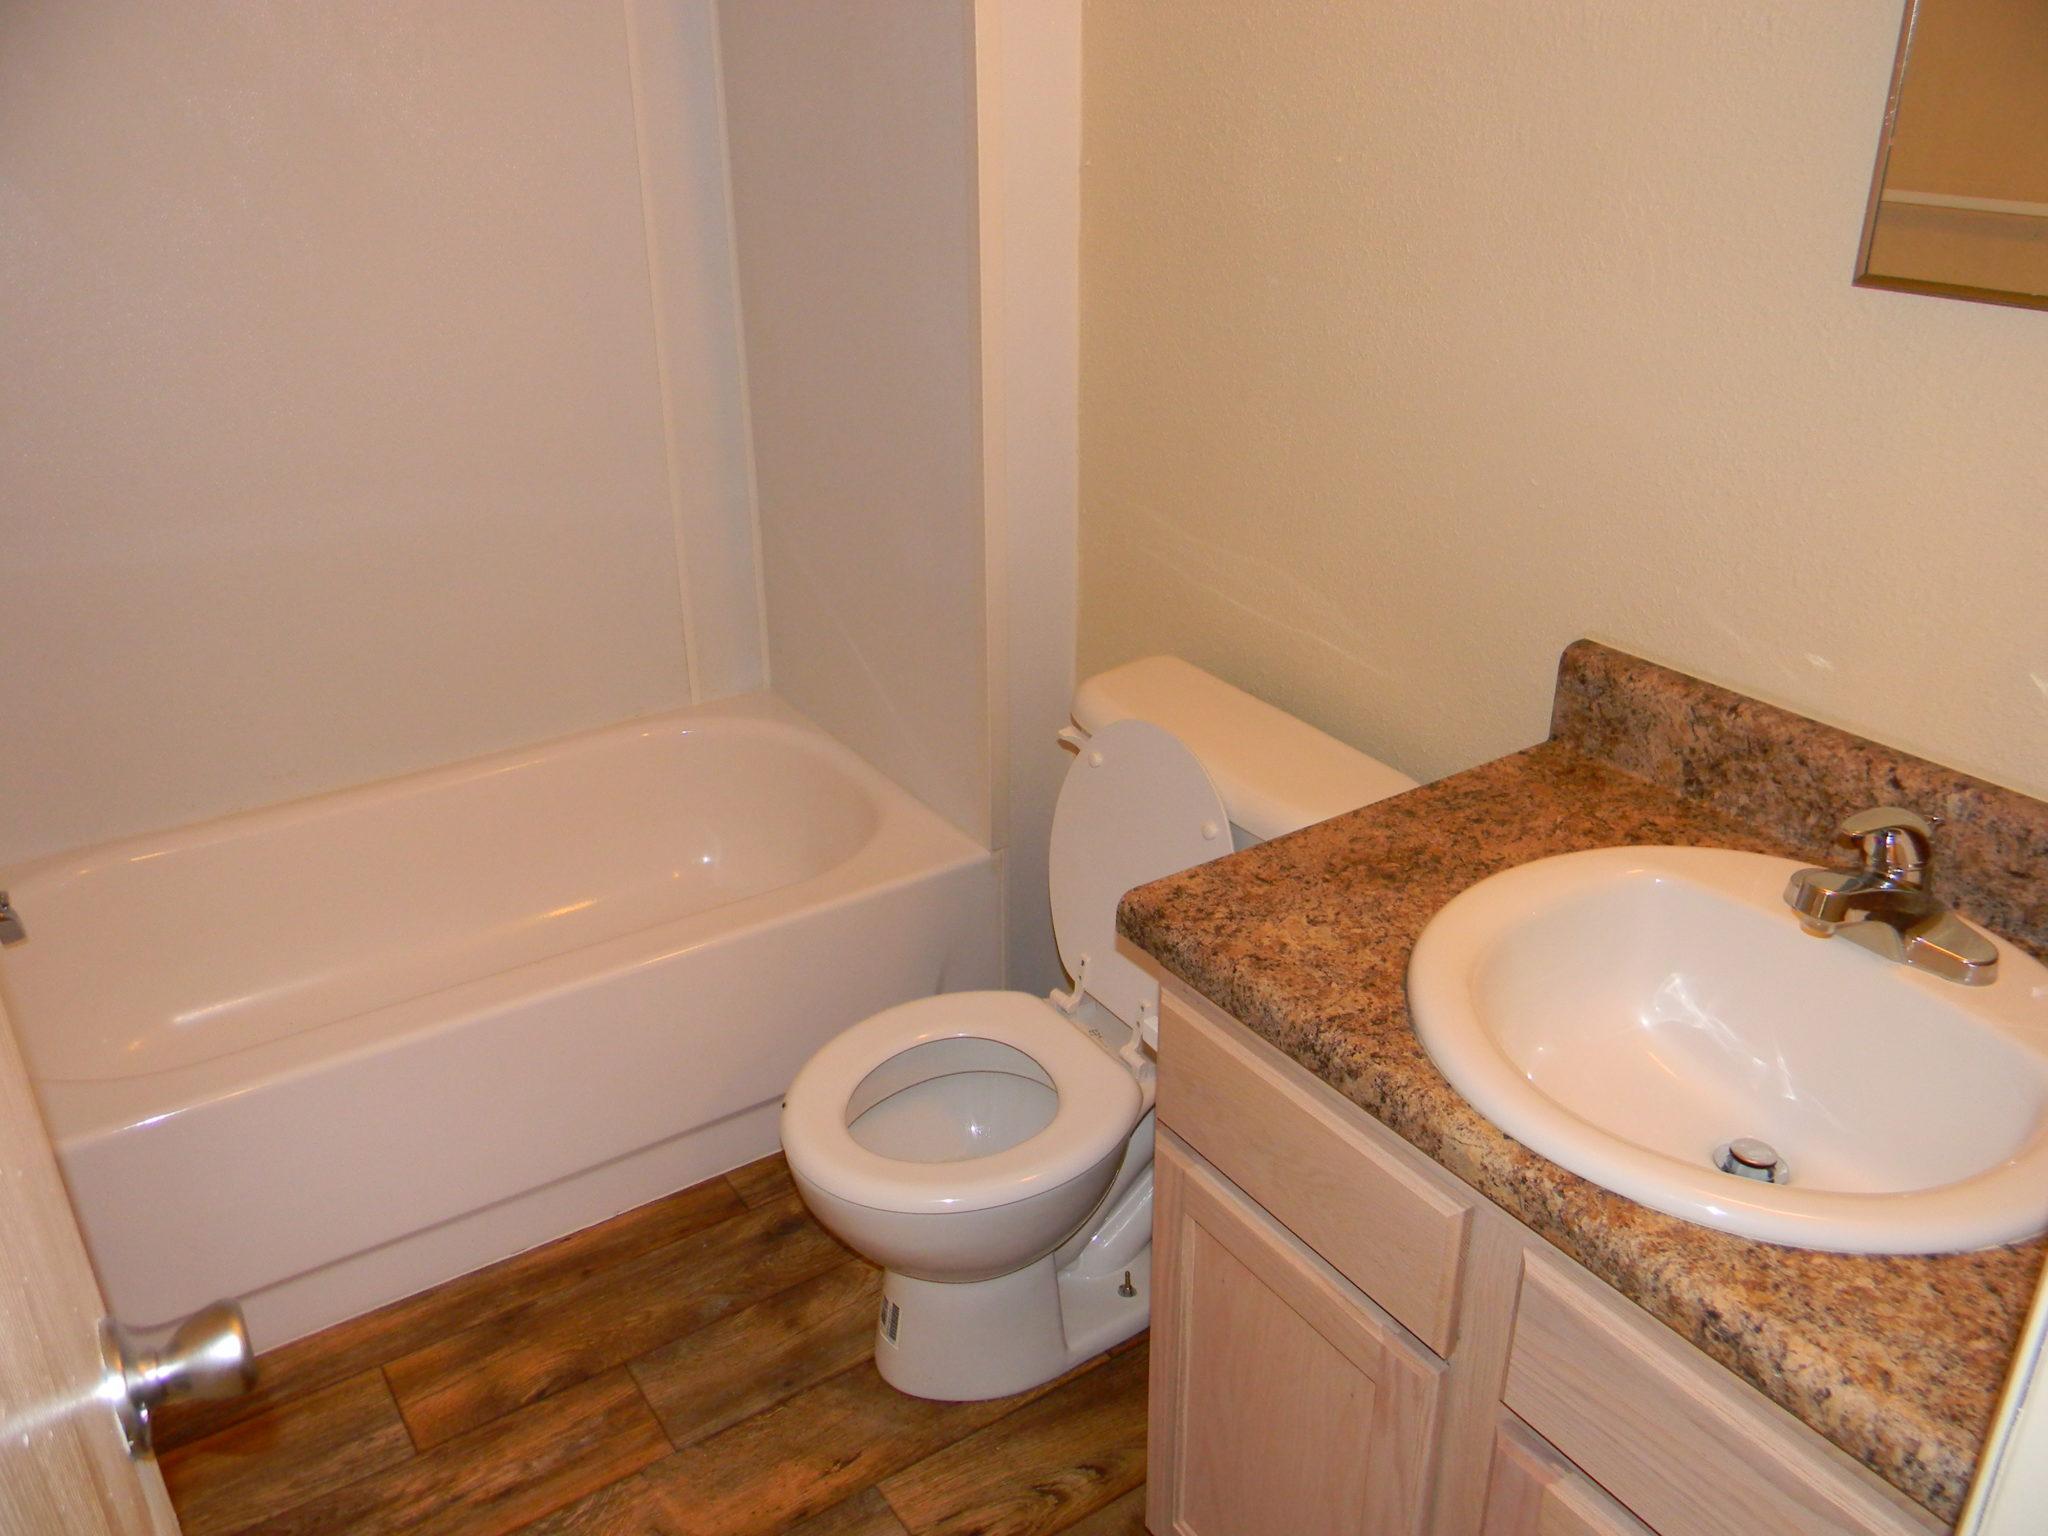 Lioncrest Studios Joplin MO bathroom